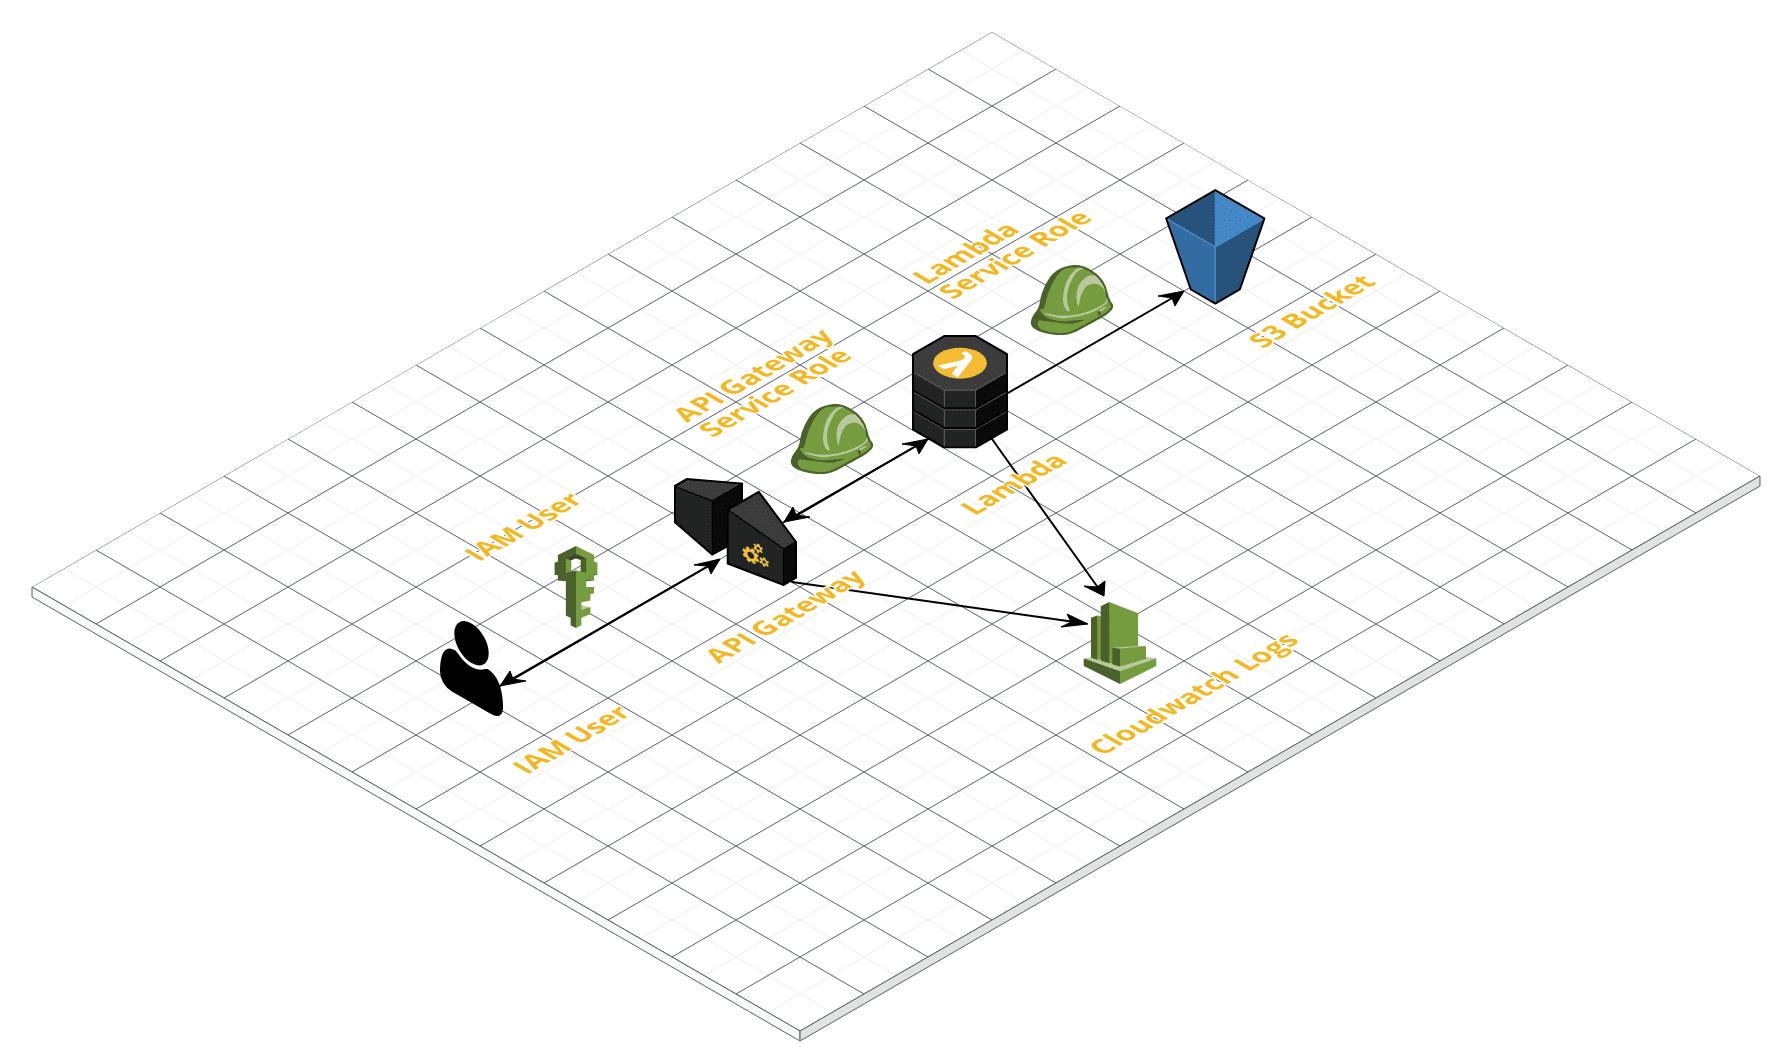 How To Build An Api With Aws Lambda And Api Gateway Using